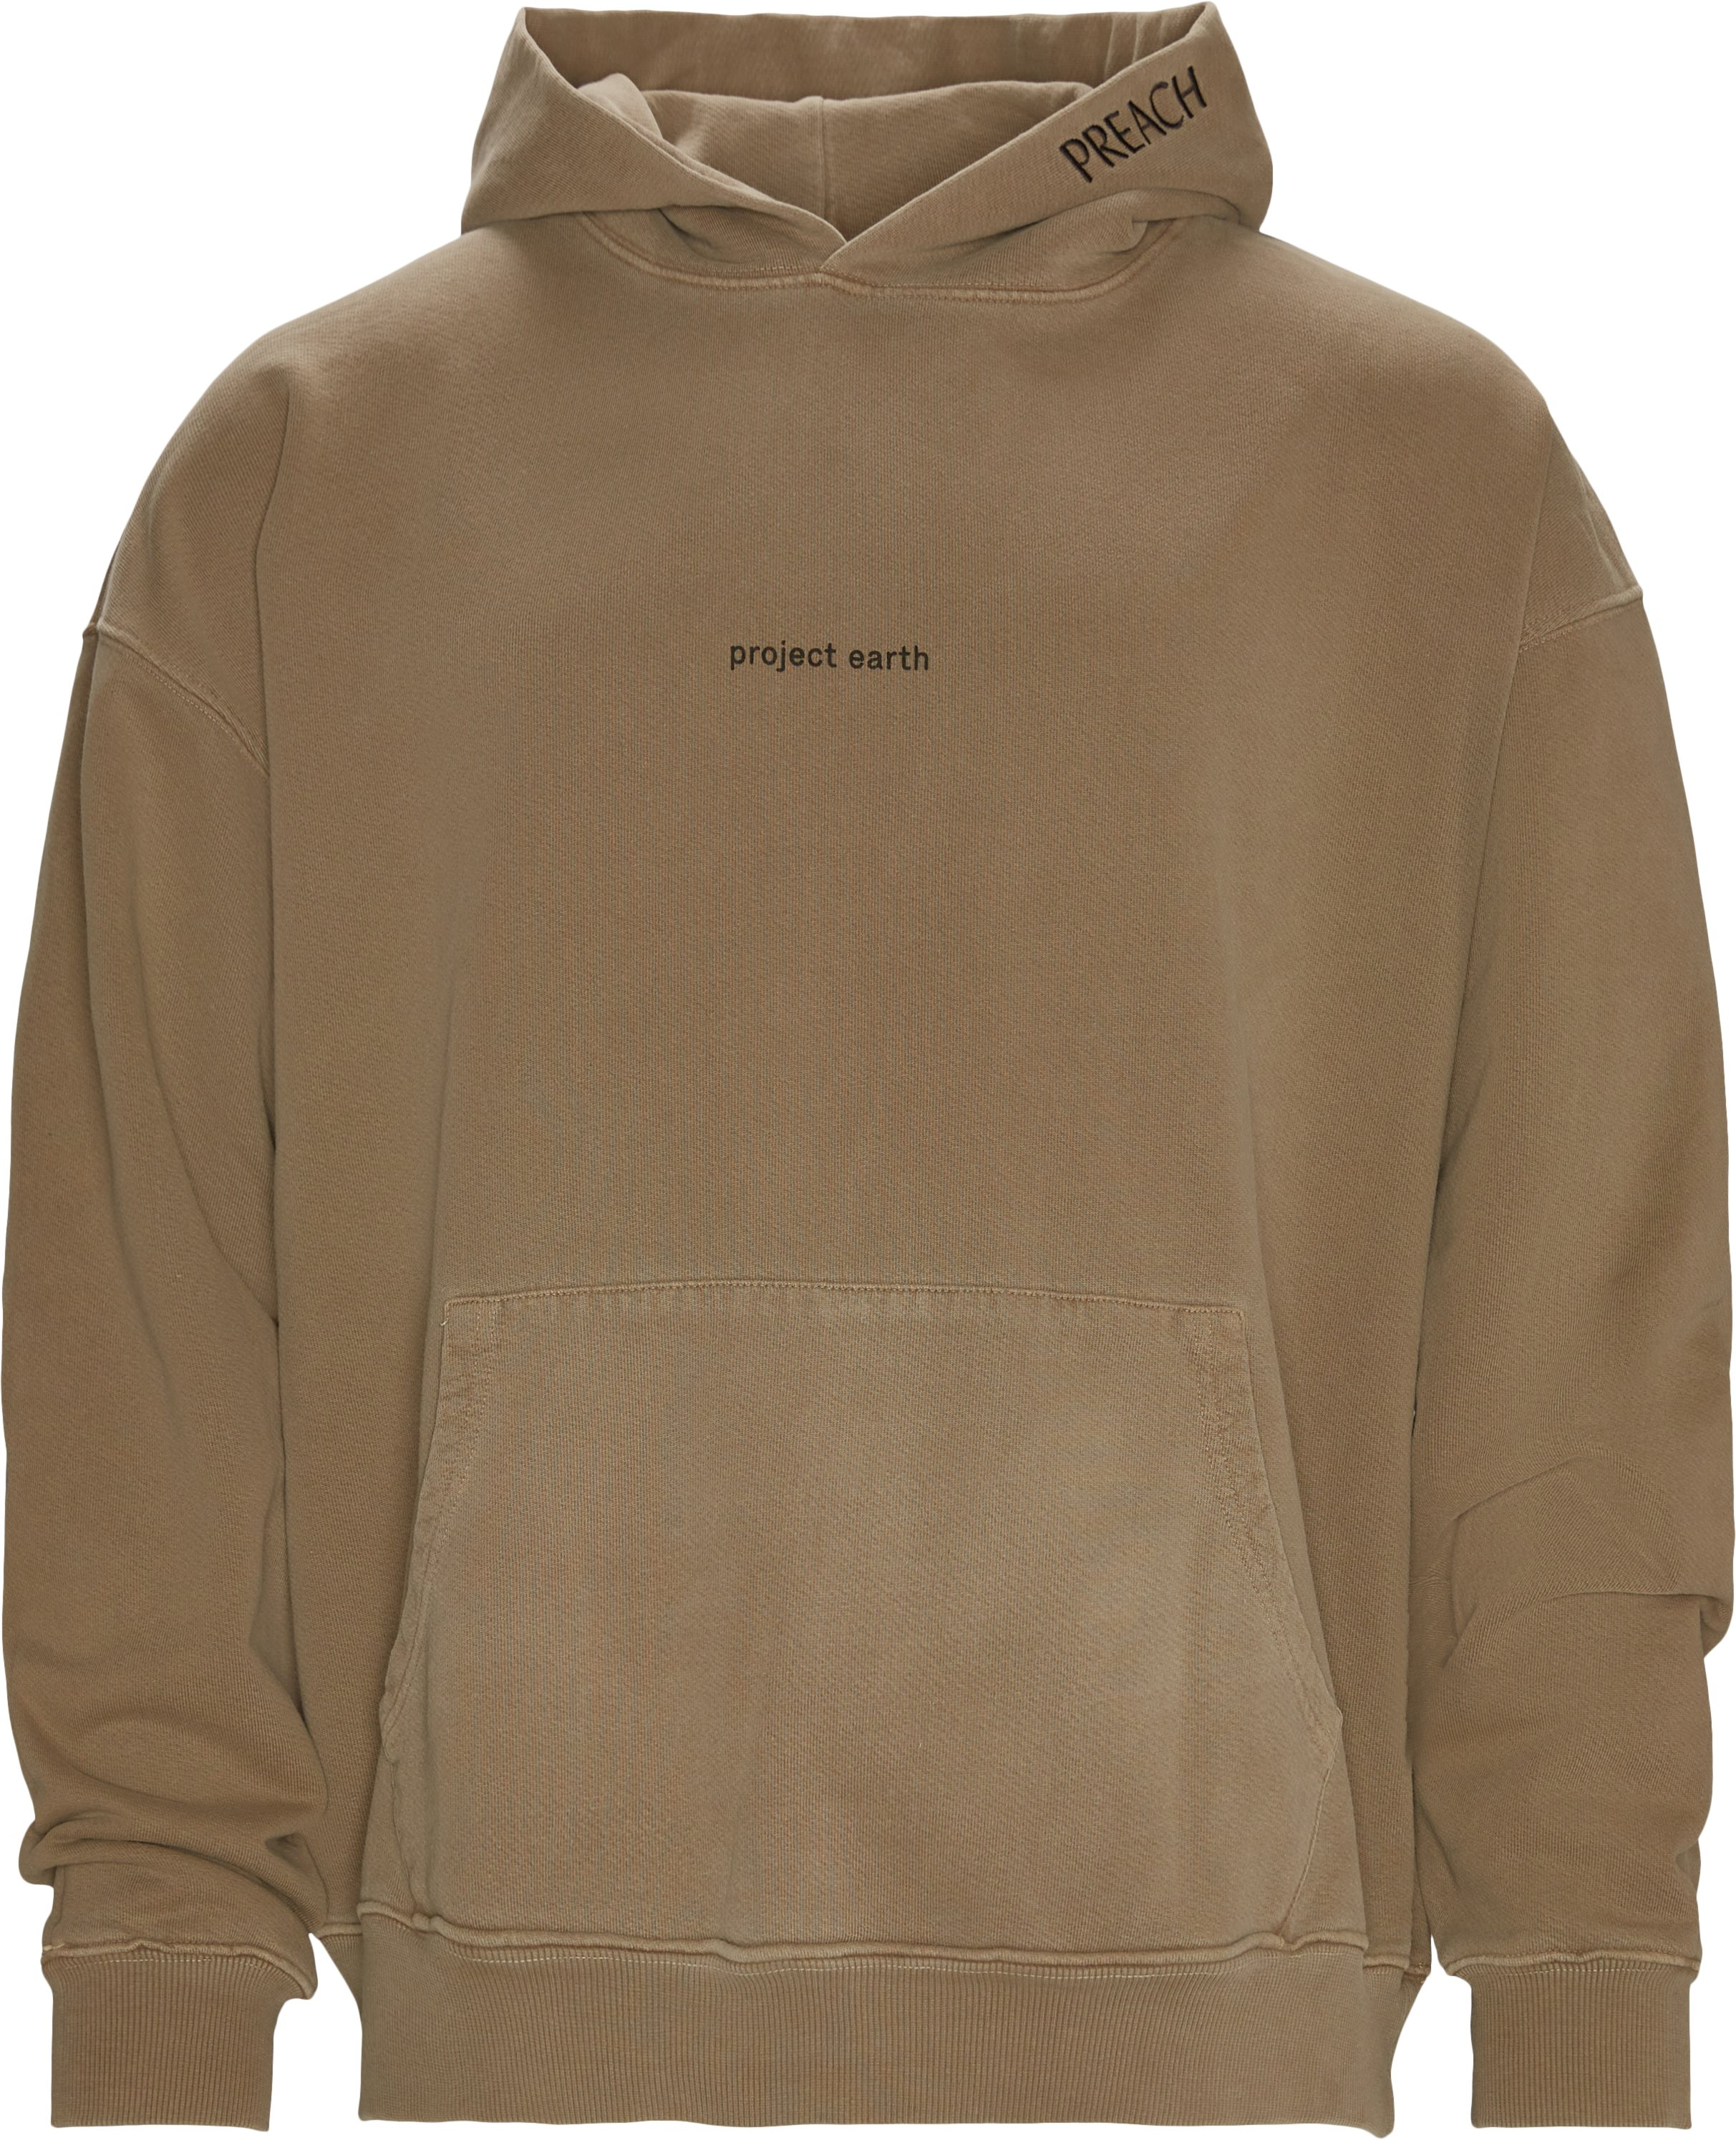 Oversized project earth hoodie - Sweatshirts - Oversize fit - Brun